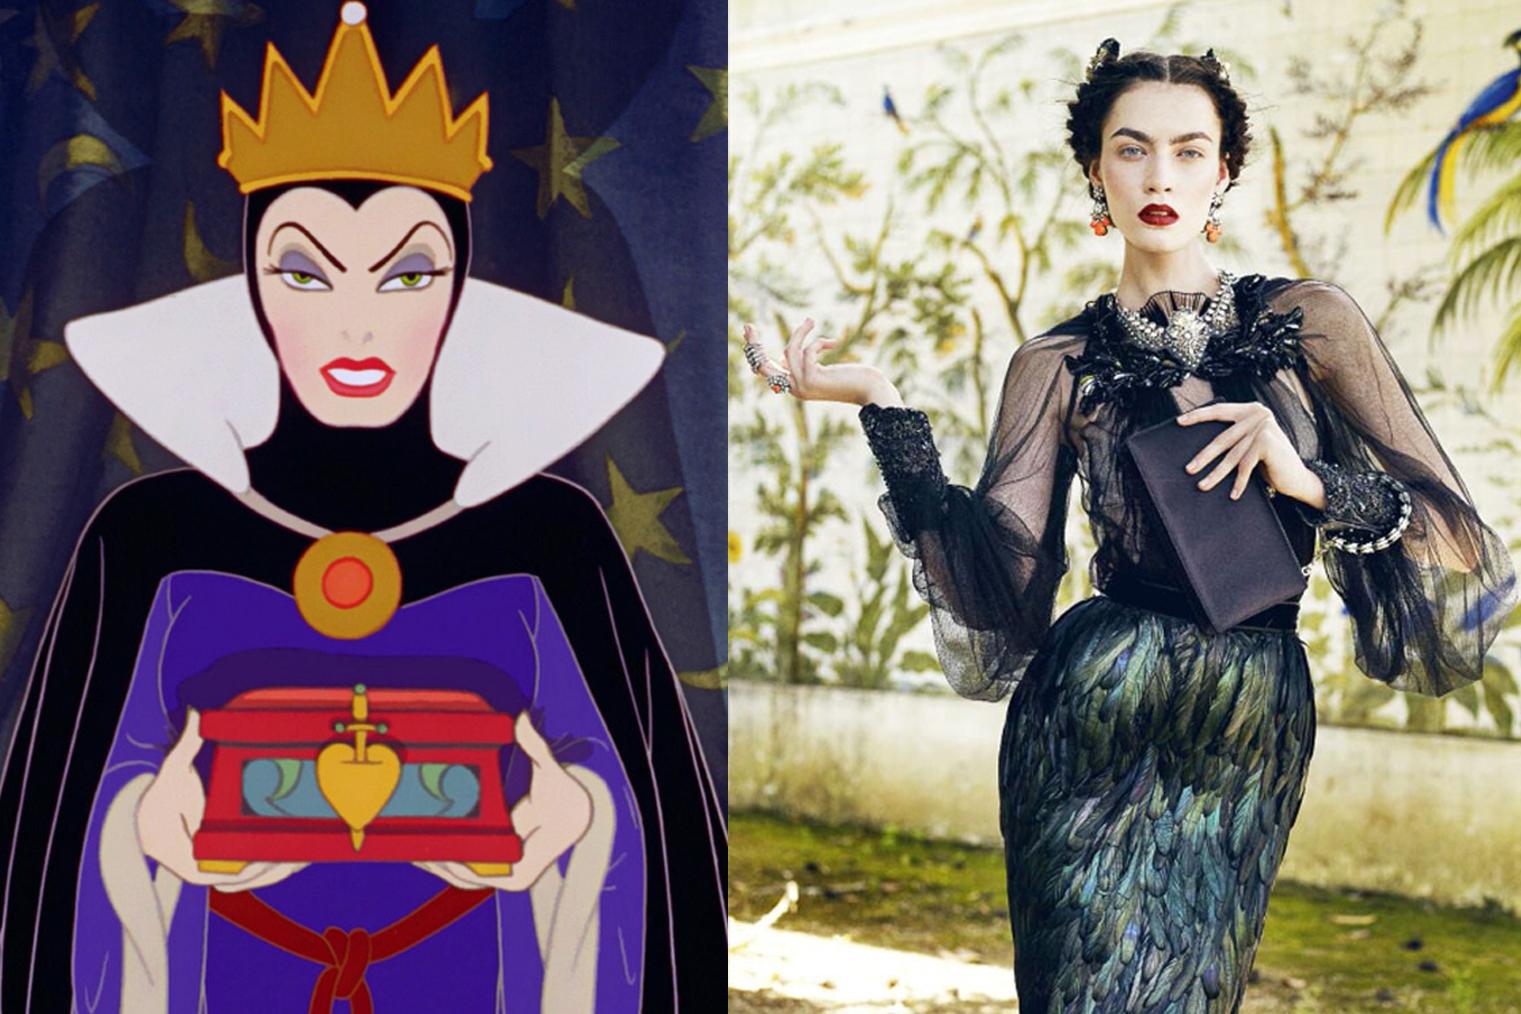 patrycja-gardygajlo-vs-evil-queen1